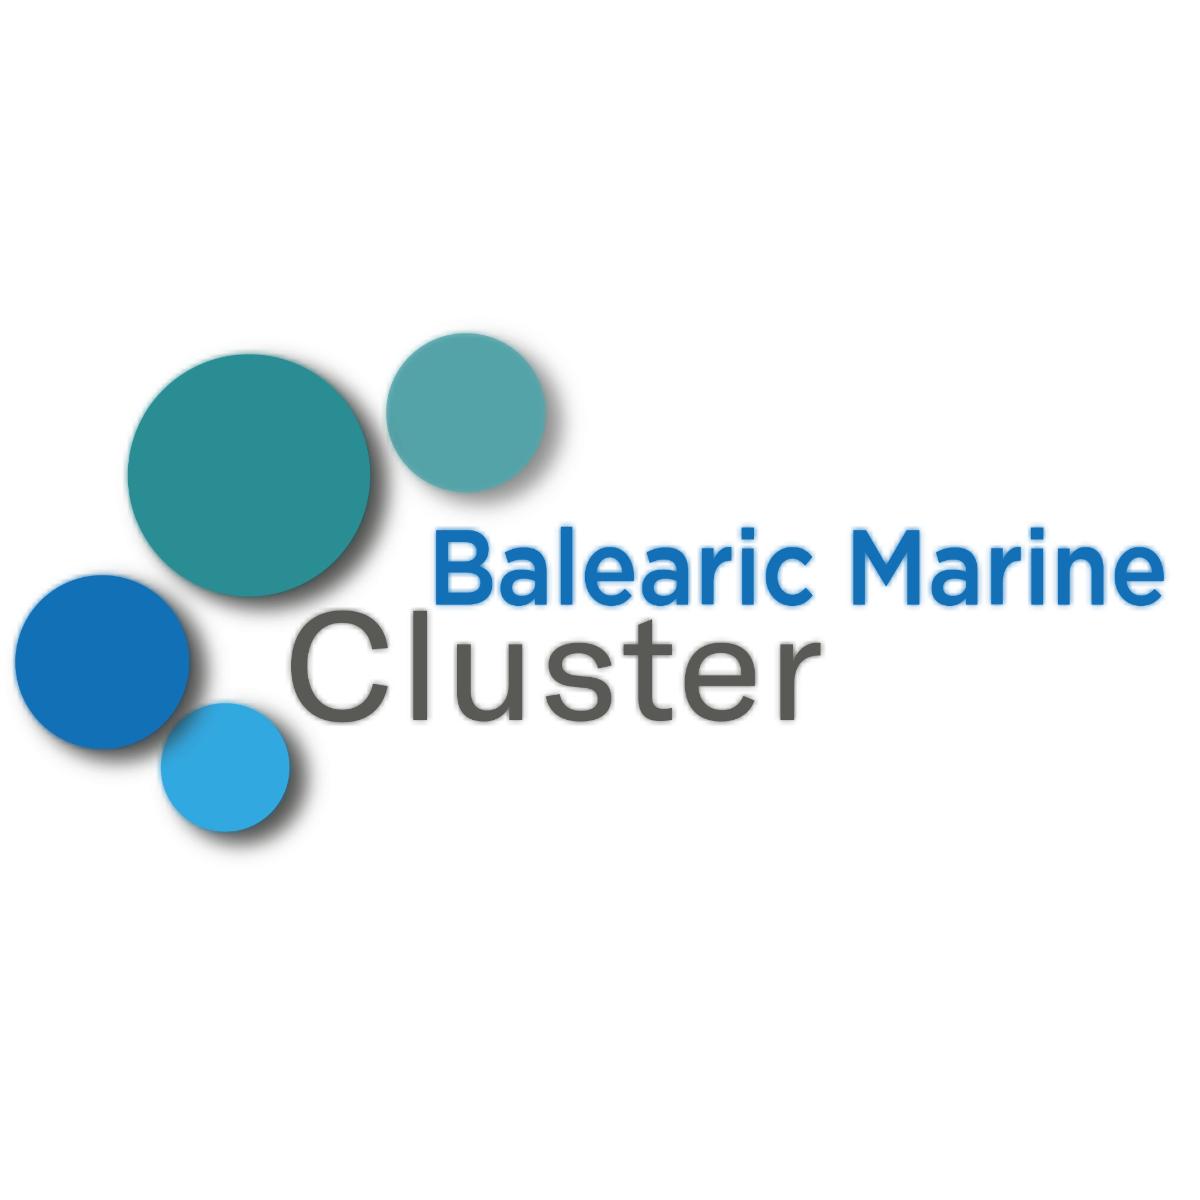 Balearic-Marine-Cluster-square.png.jpg